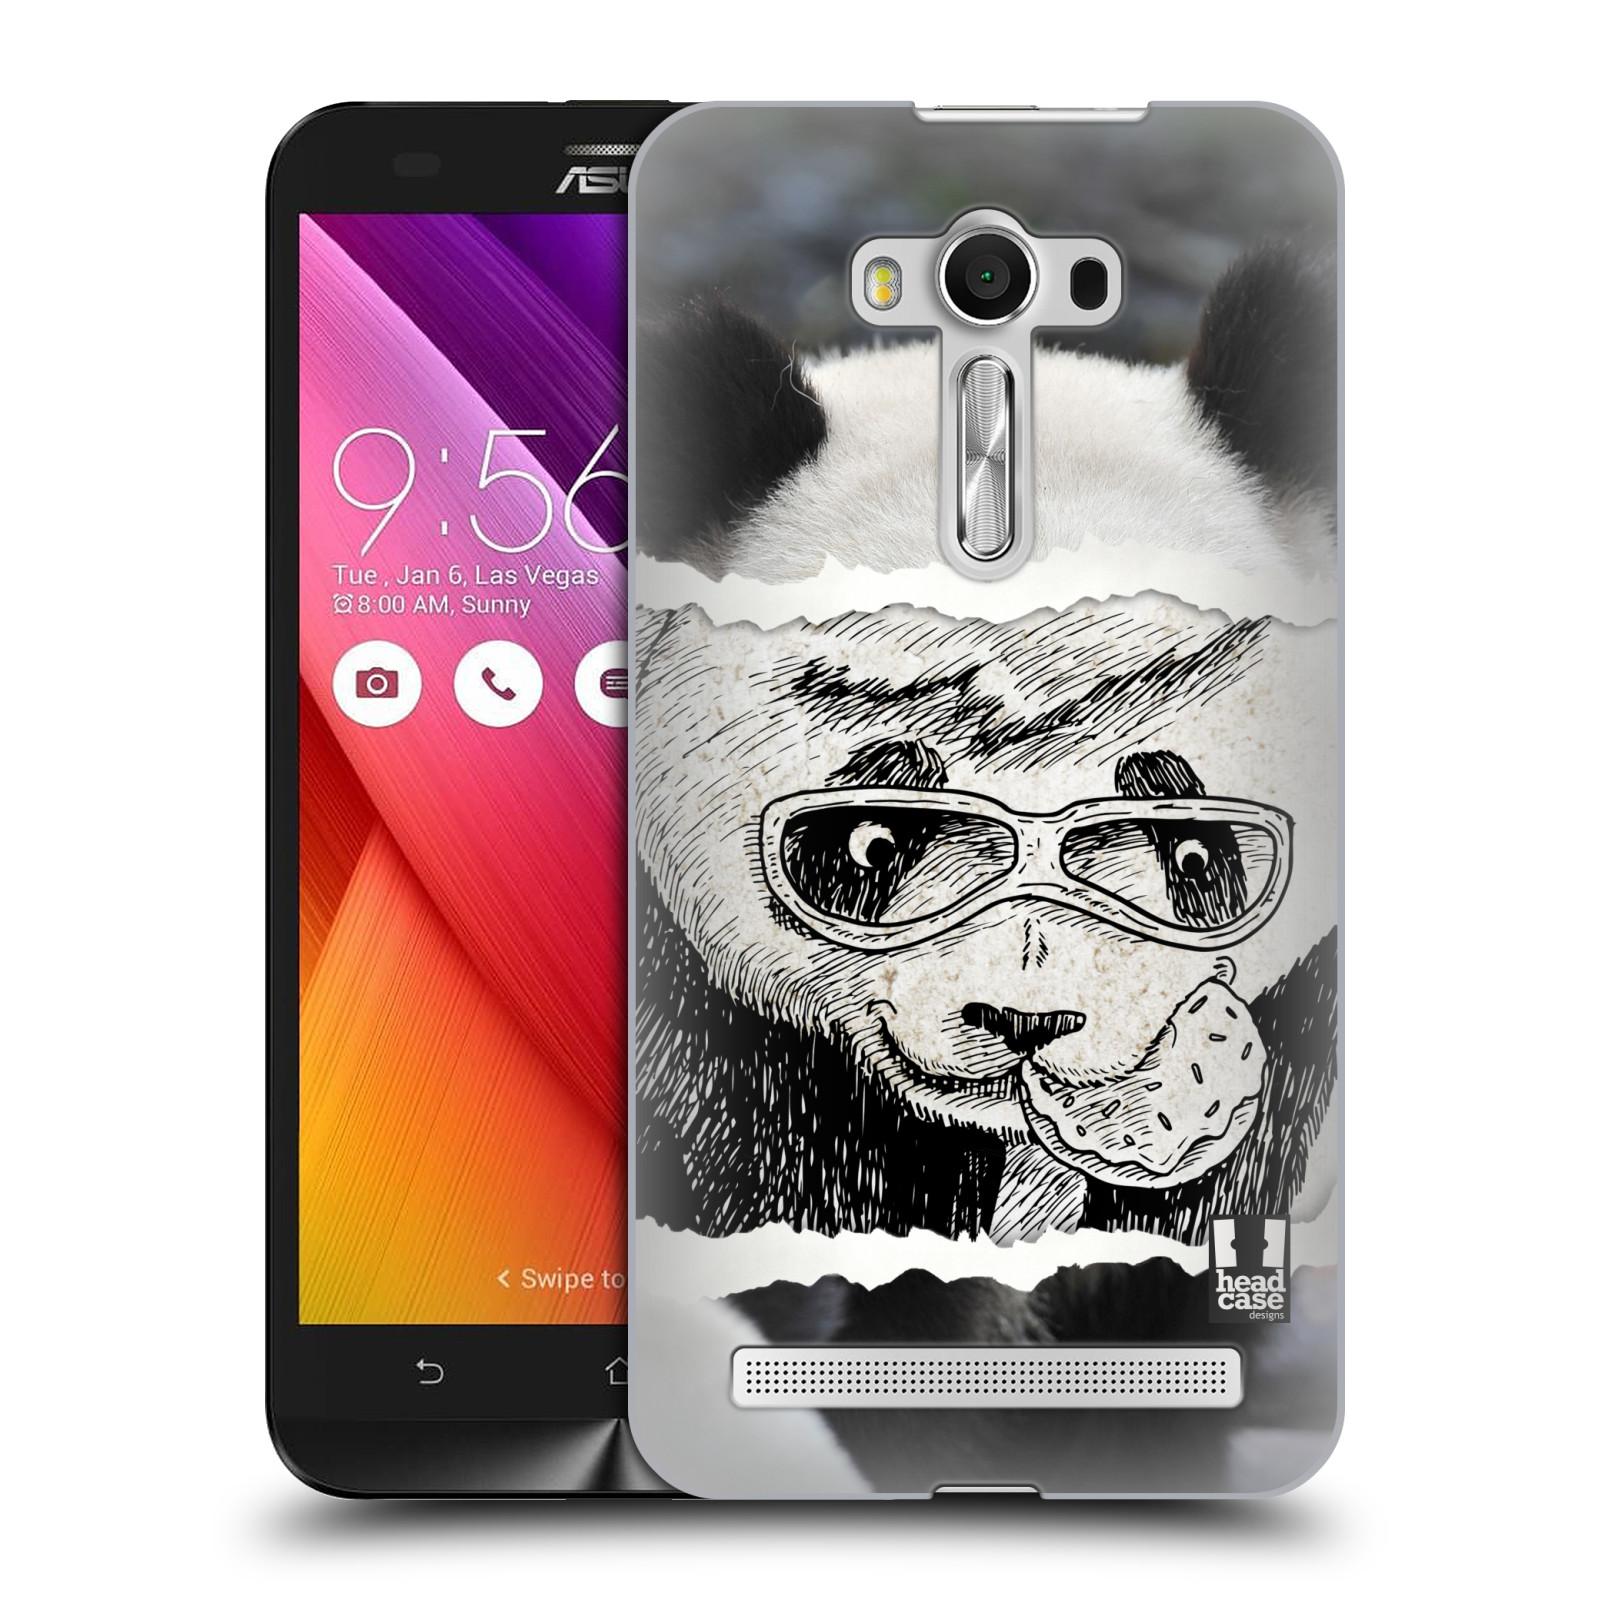 HEAD CASE plastový obal na mobil Asus Zenfone 2 LASER (5,5 displej ZE550KL) vzor zvířata koláž roztomilá panda